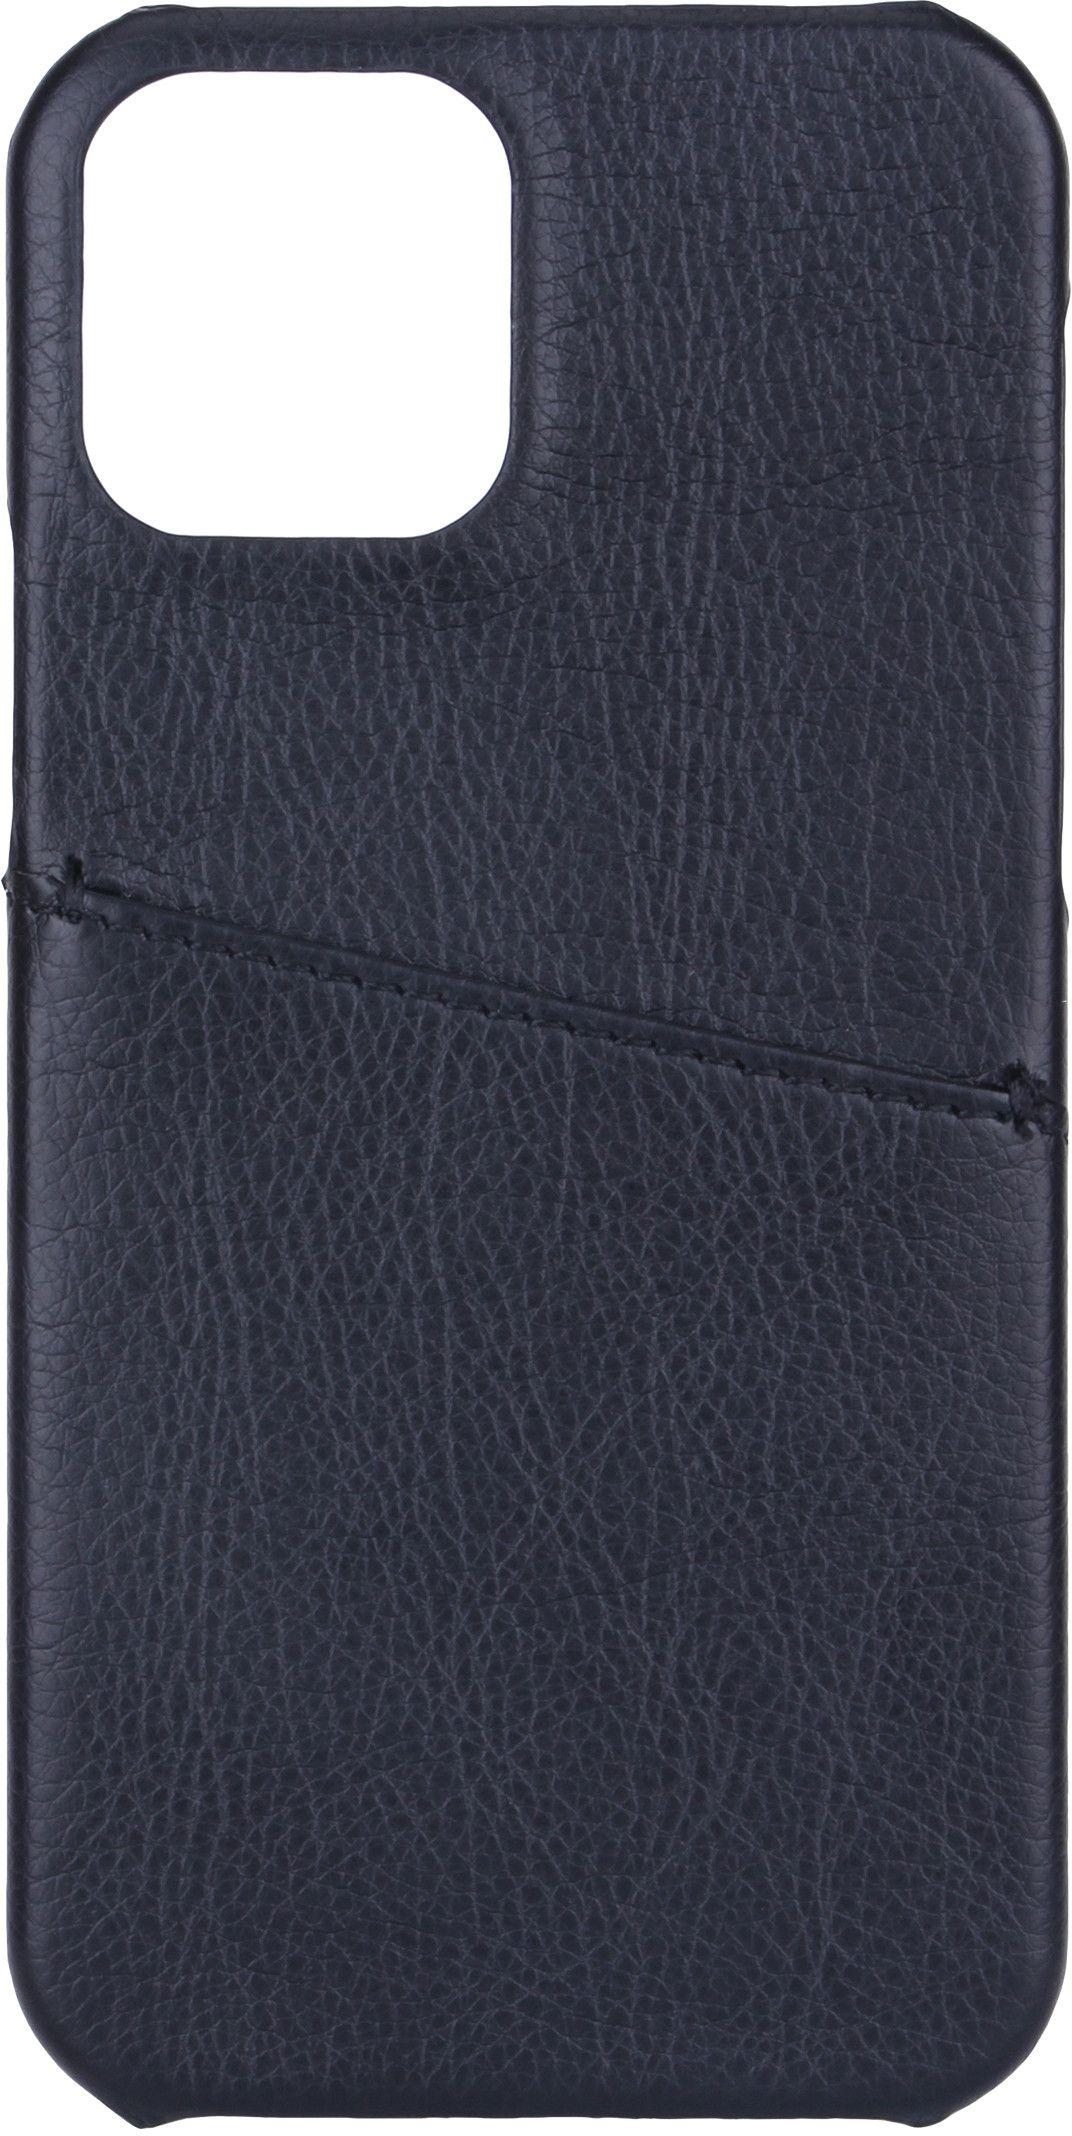 "Gear Onsala One Card Case (iPhone 12 6,1"") - Brun"